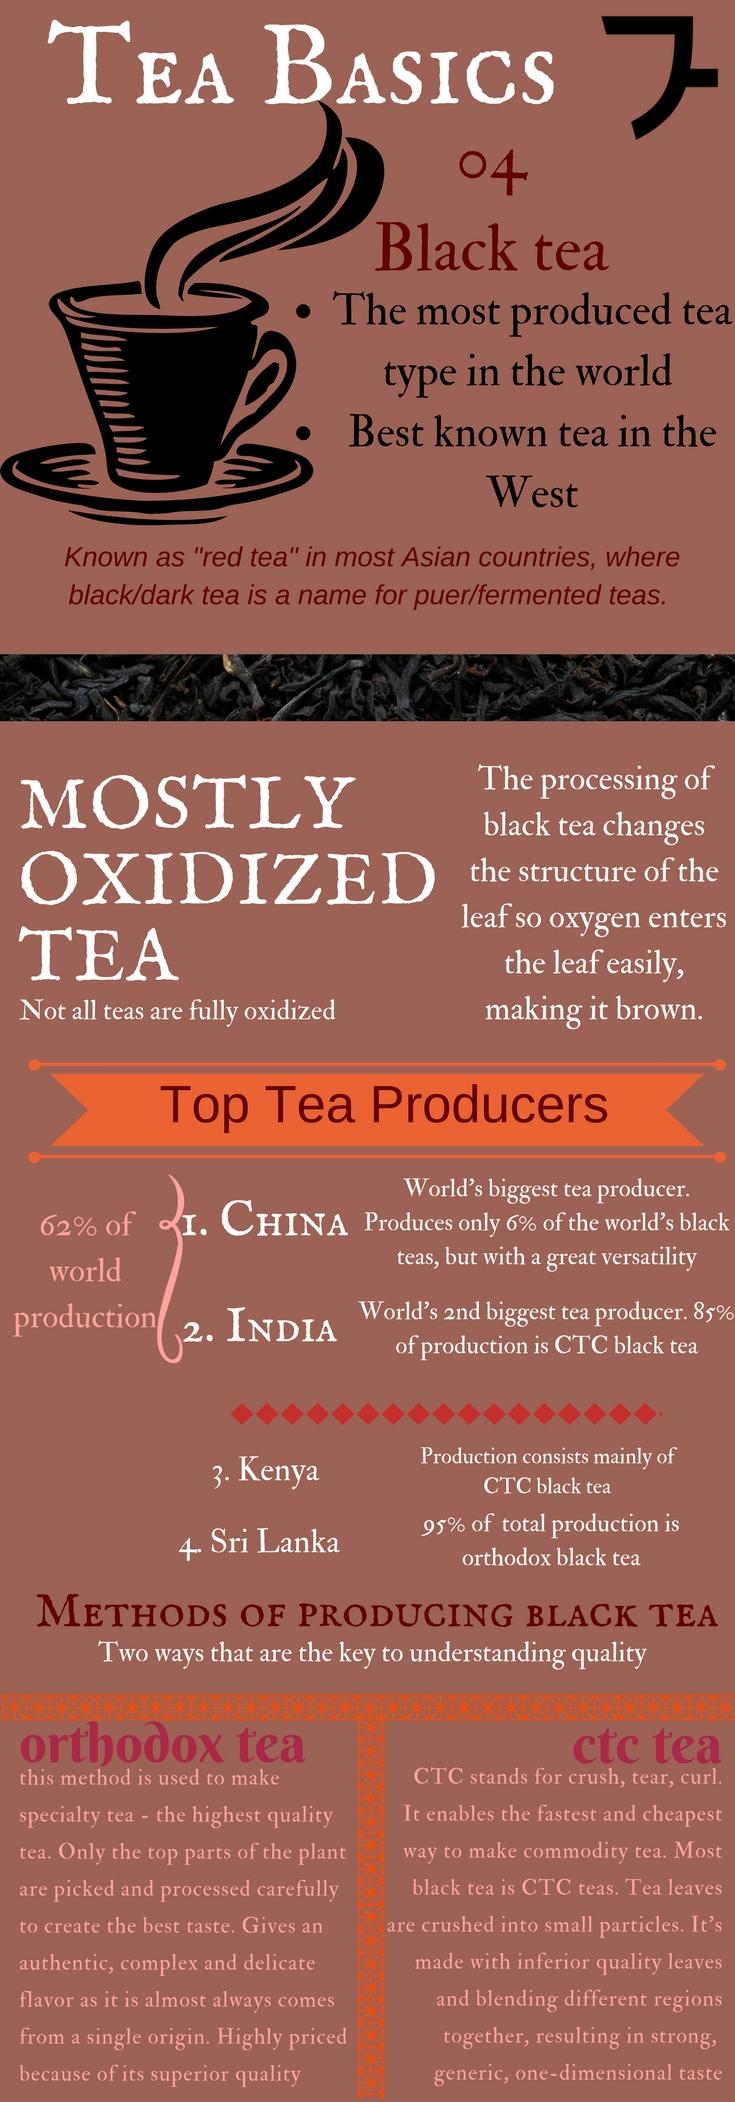 Tea Basics04.jpg